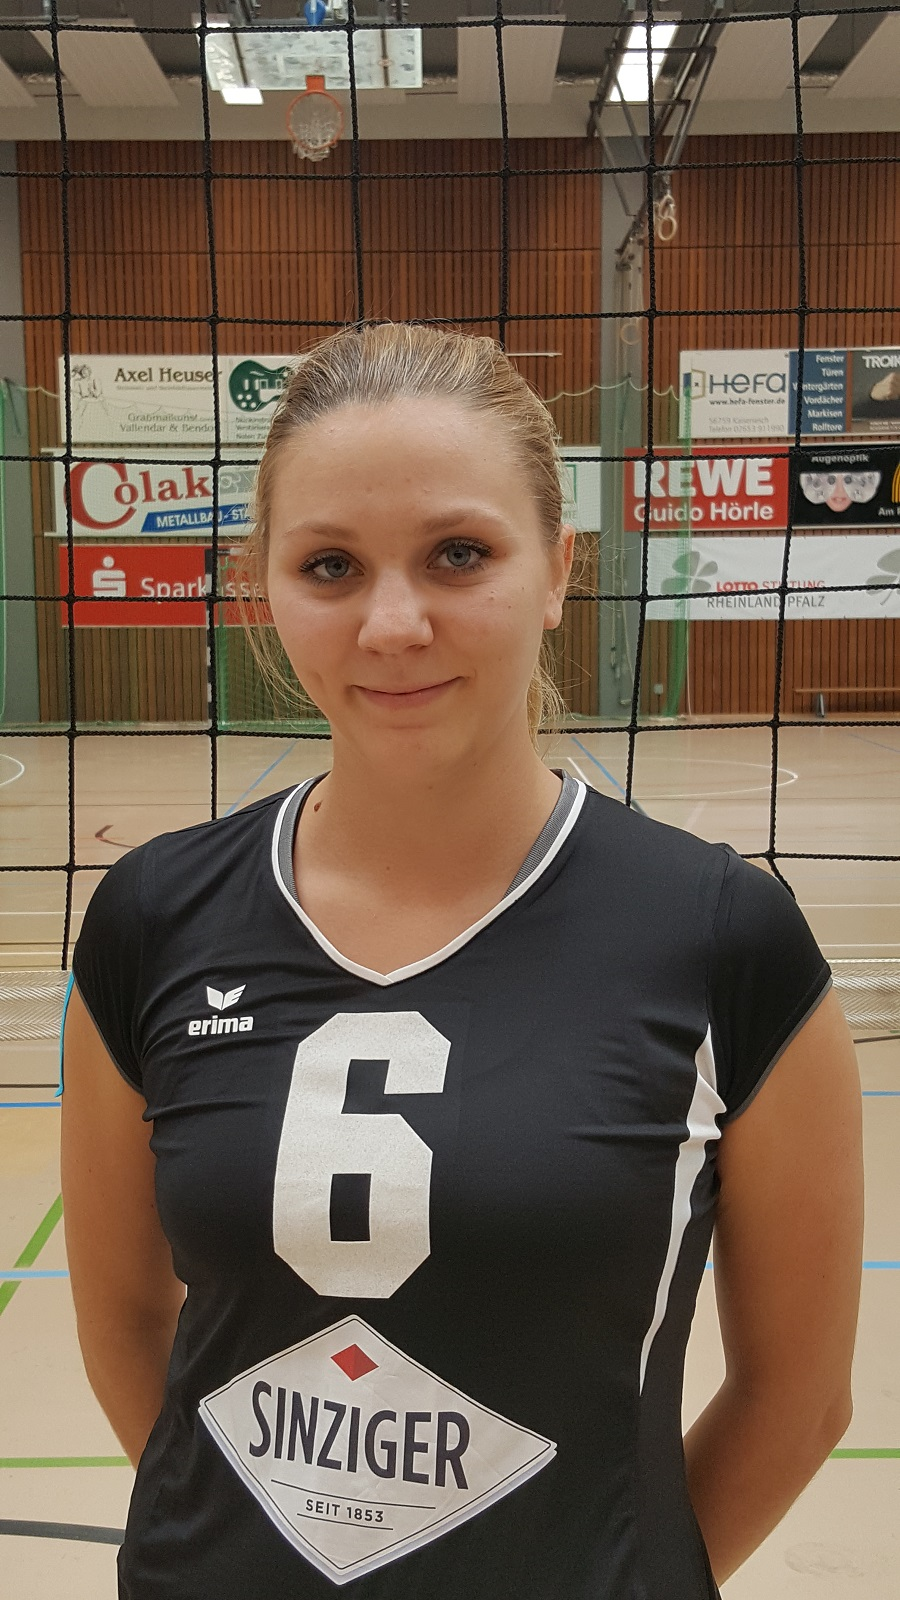 Erika Sebold